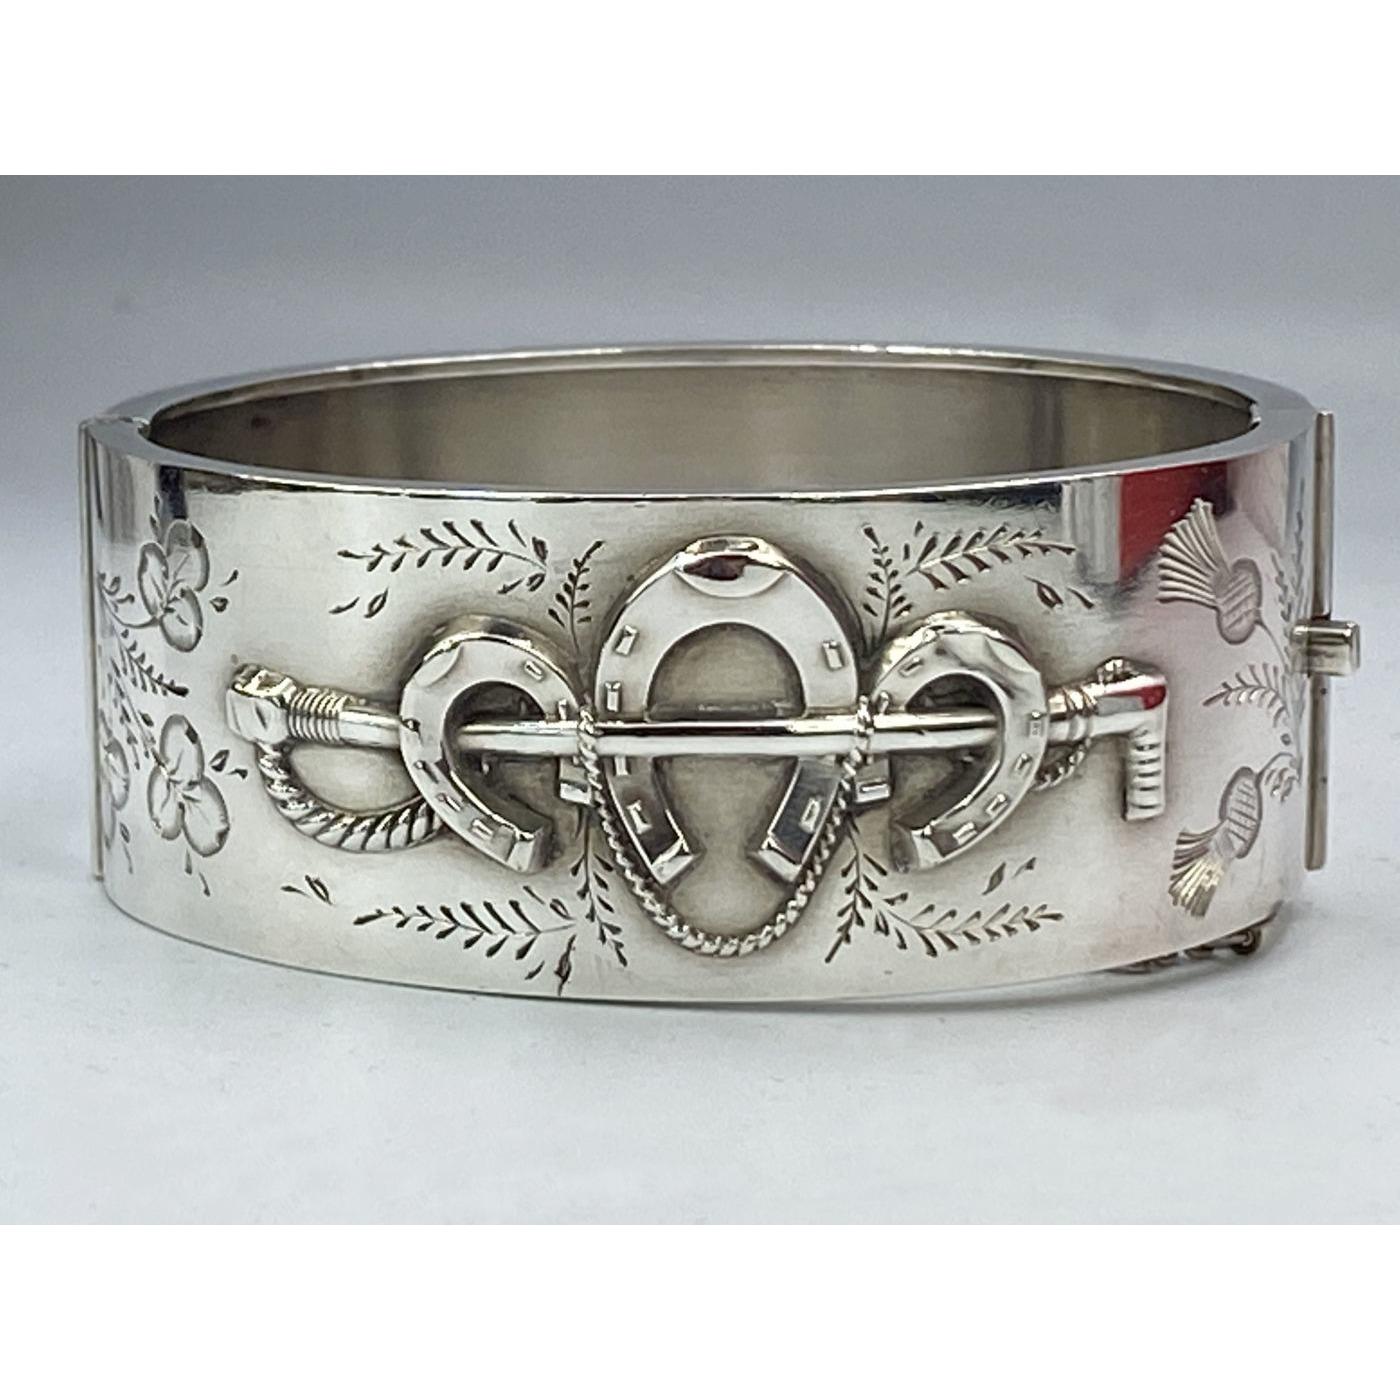 Awesome Triple Horseshoe Antique English Silver Bangle